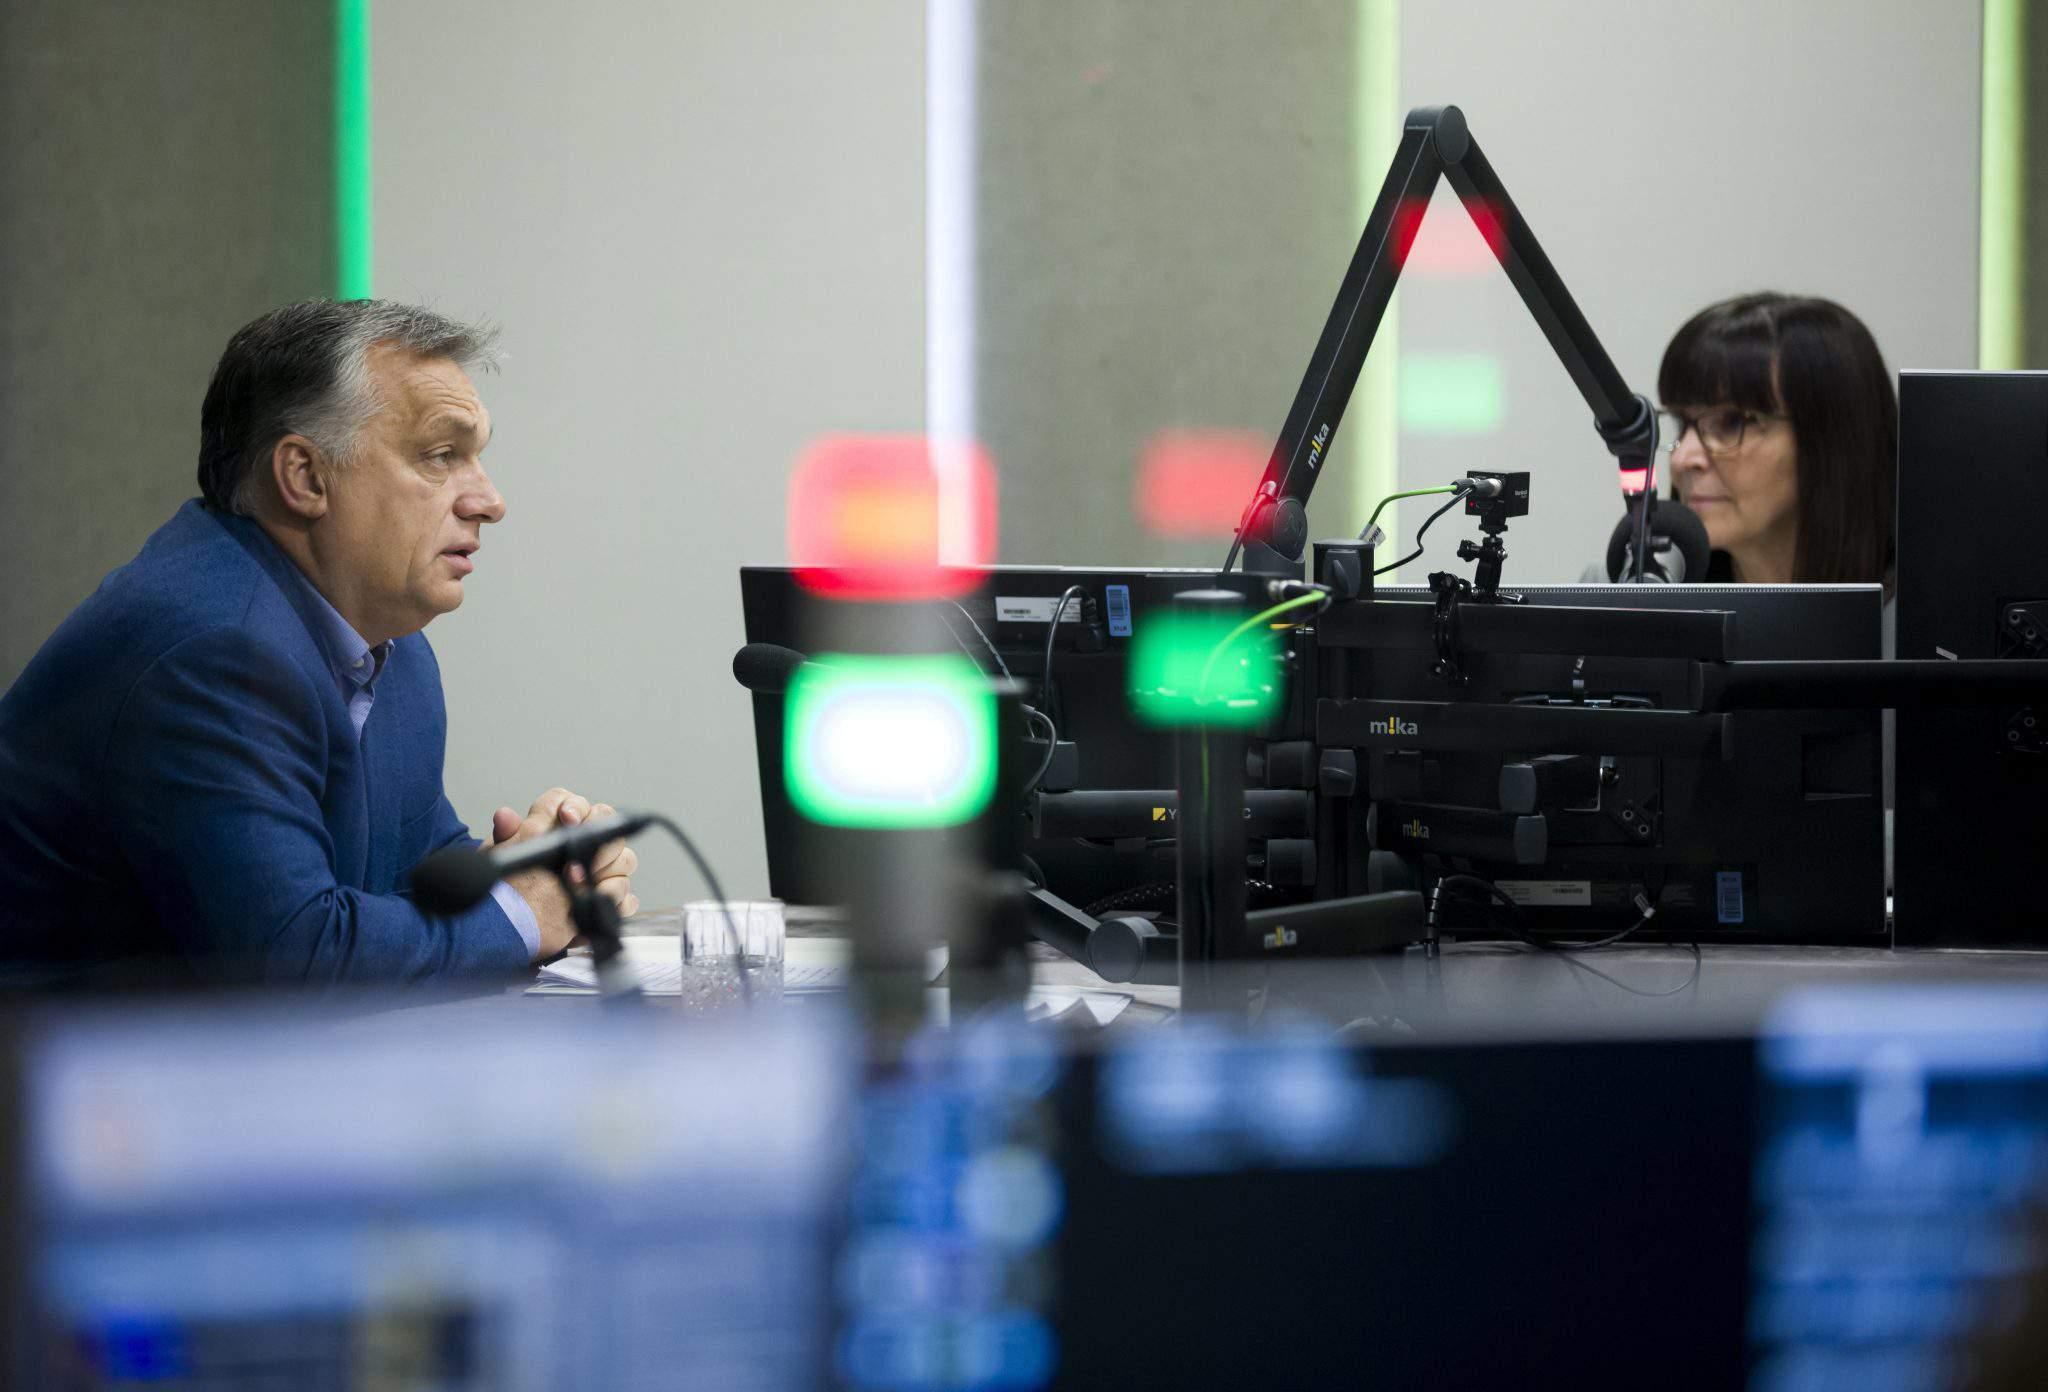 orbán radio interview